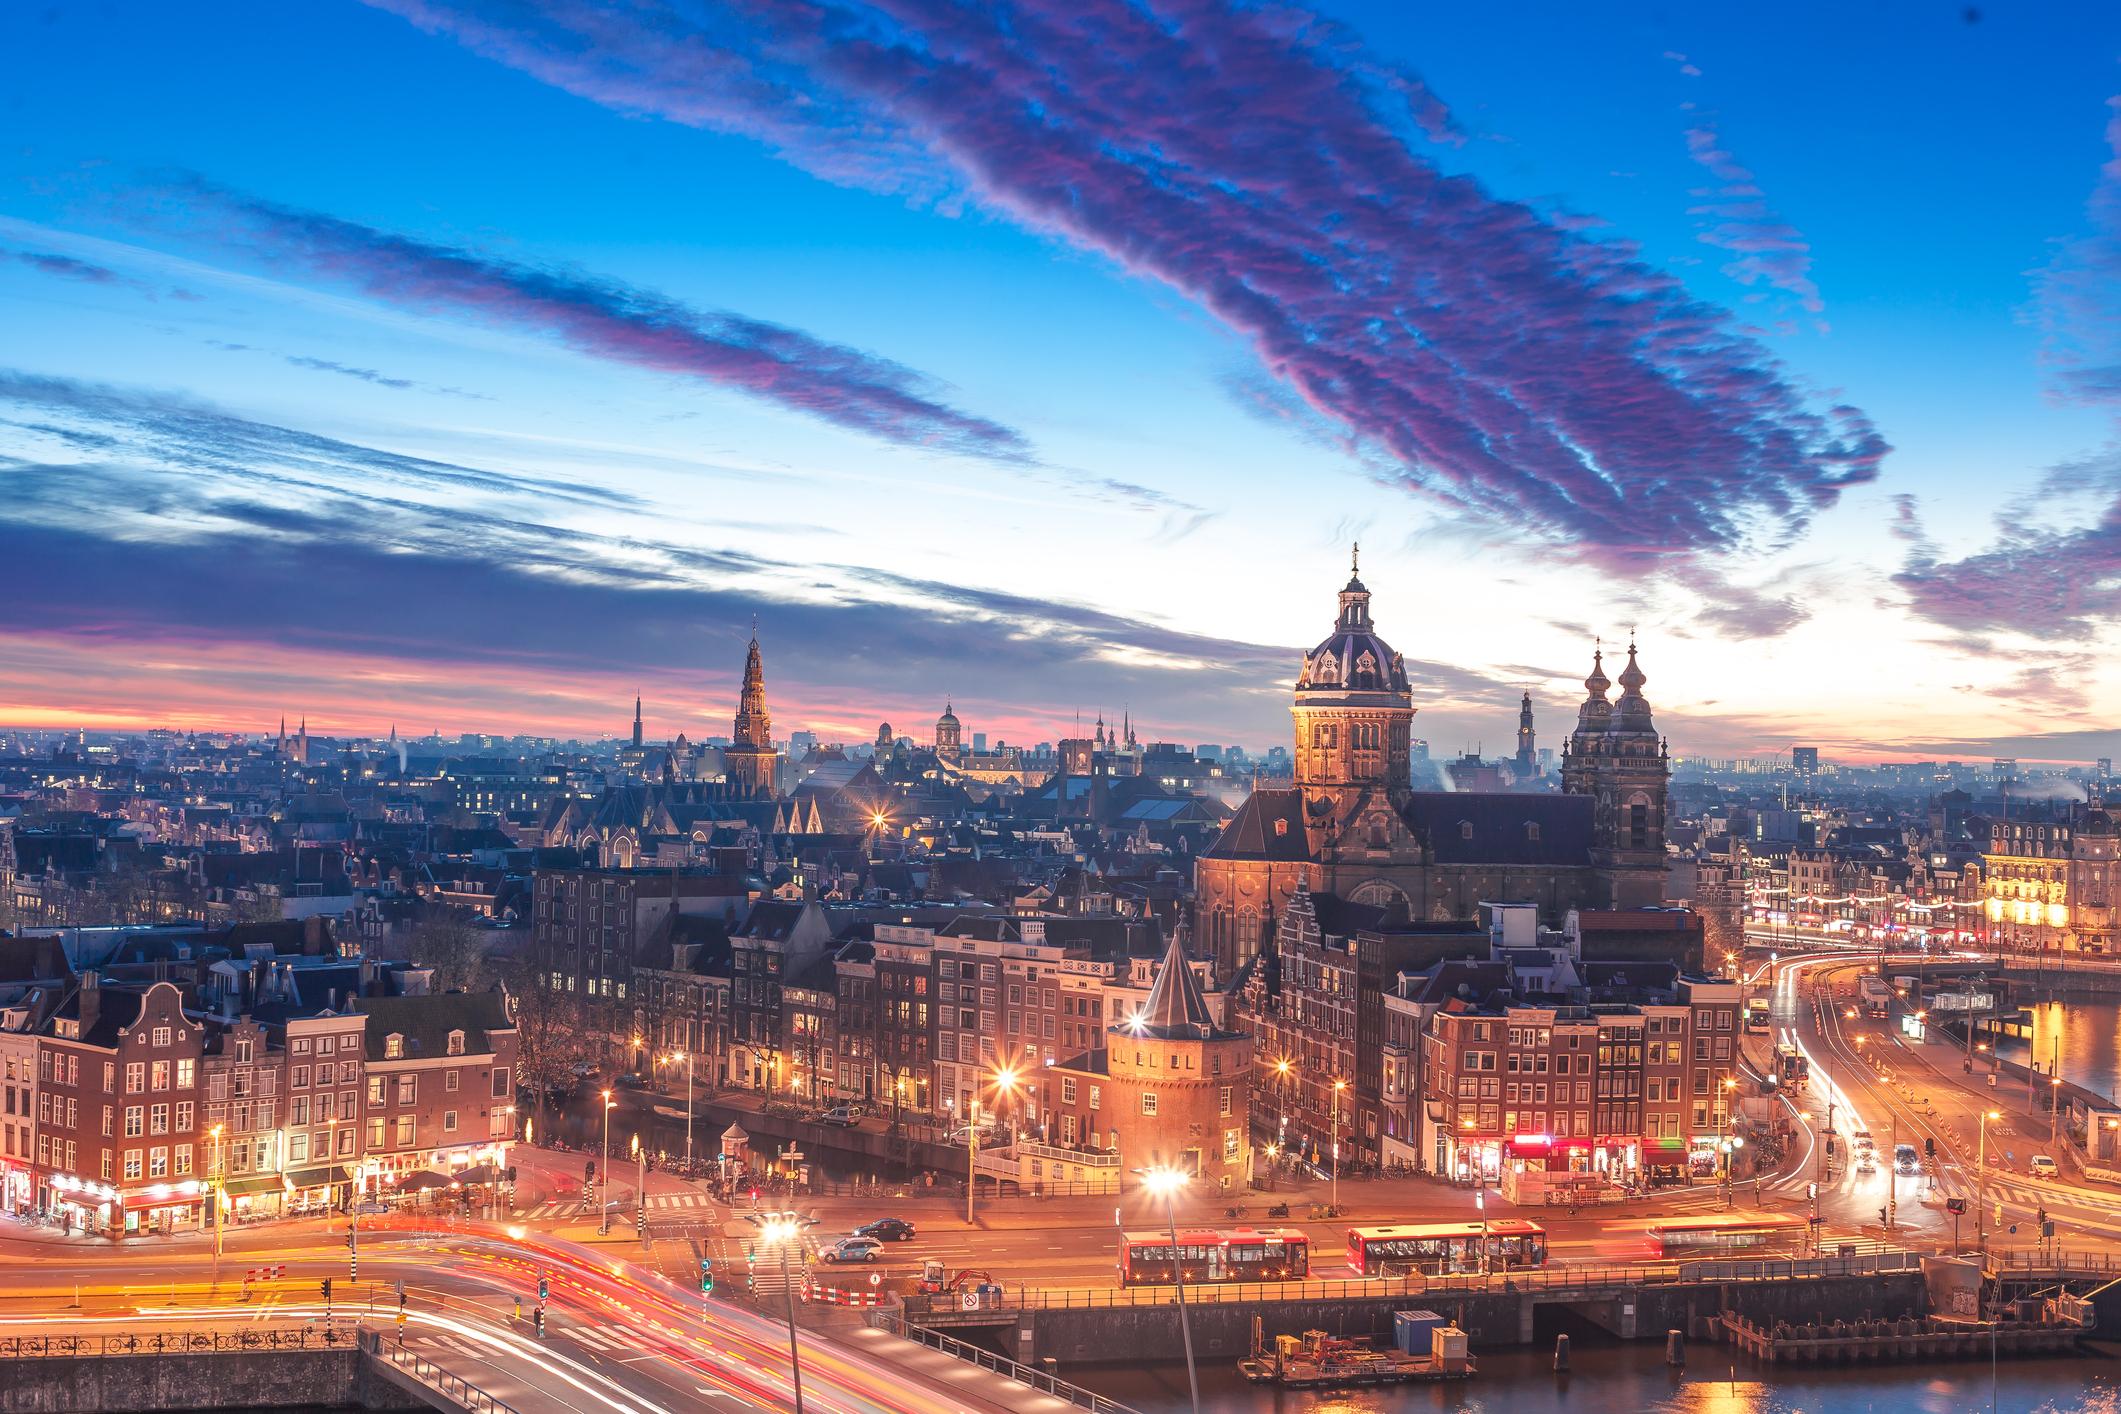 Amsterdam skyline at night.